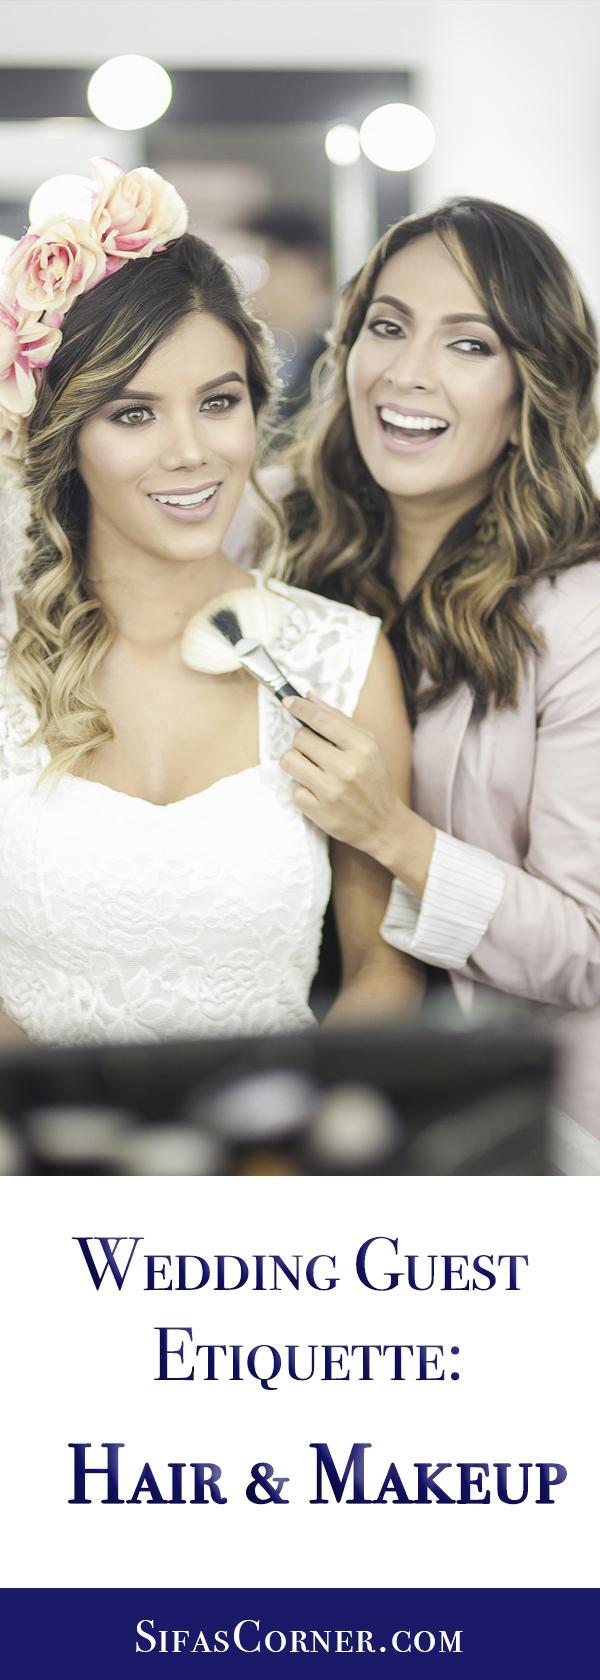 Wedding Guest Etiquette: Hair Makeup